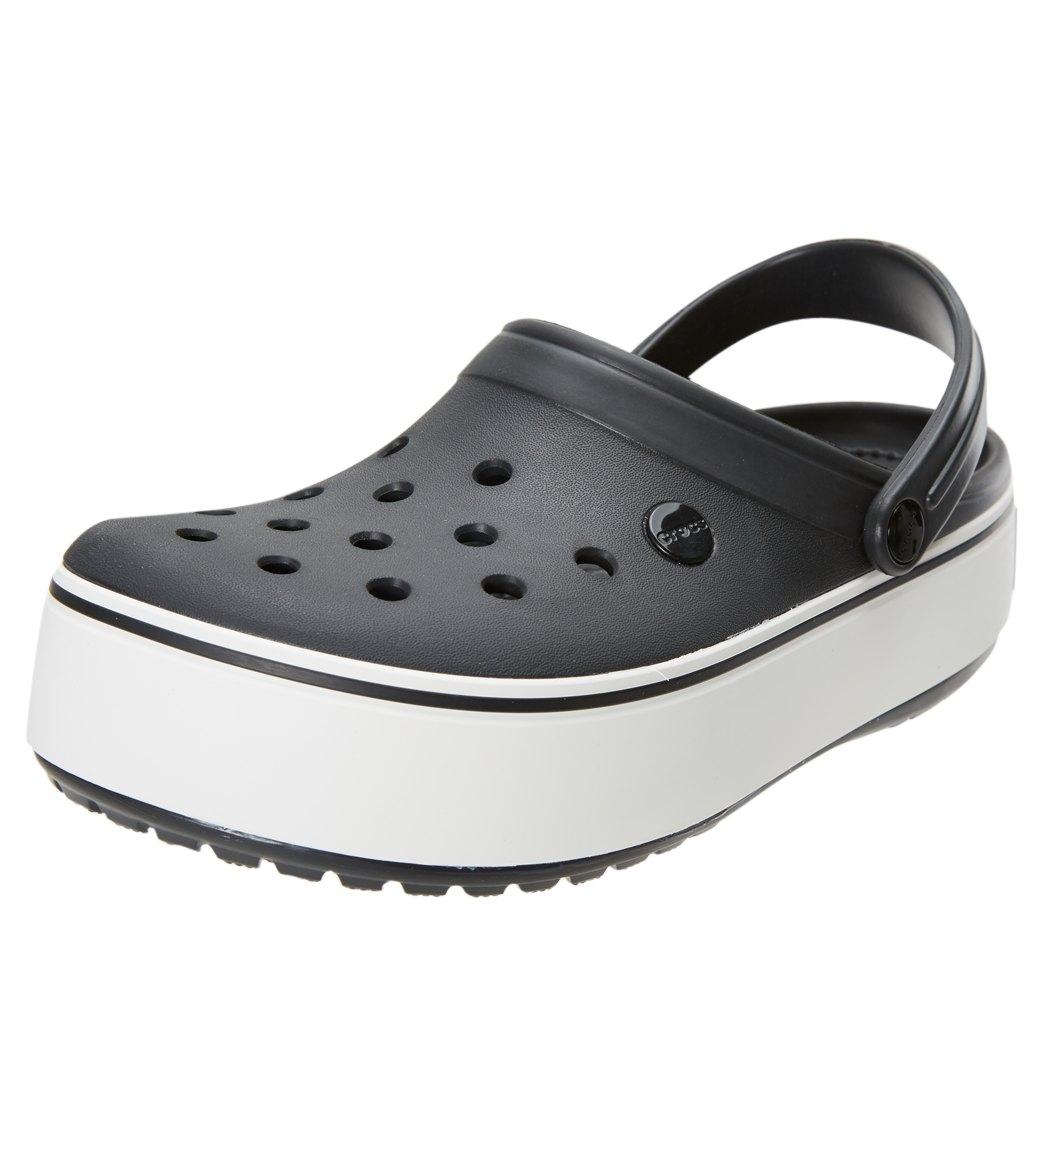 7f52ed8e535 Crocs Crocband Platform Clog at SwimOutlet.com - Free Shipping